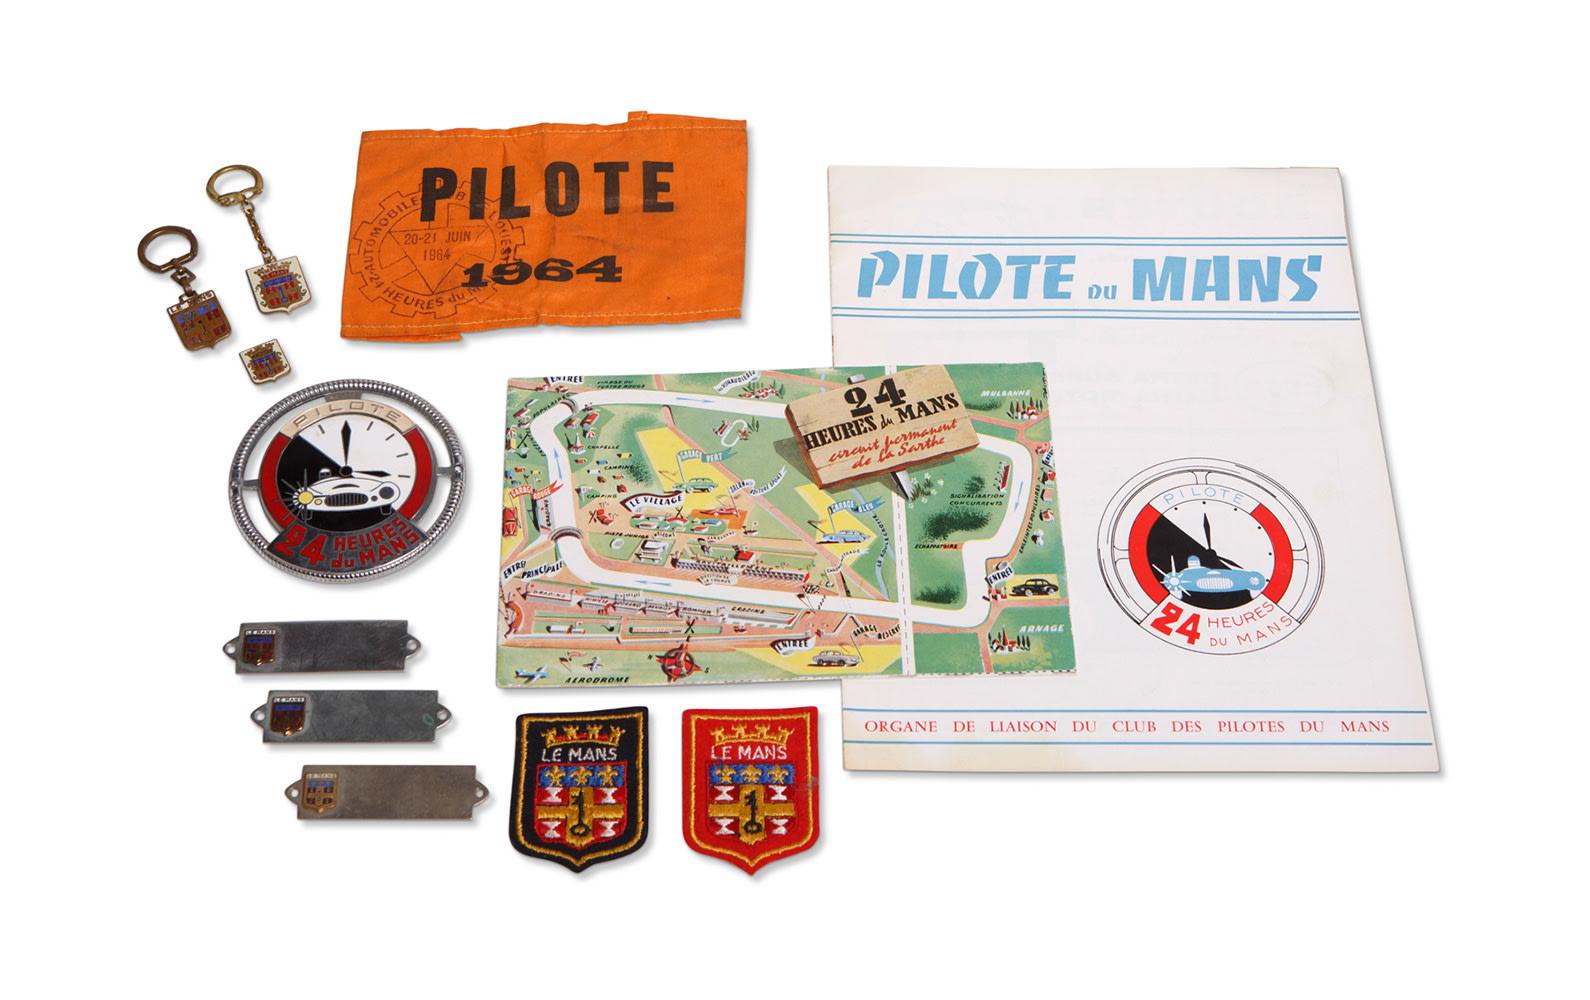 Prod/O21C - Phil Hill B 2021/B0187_1964 Le Mans Driver's Band and Memorabilia/B0187_1964_Le_Mans_Drivers_Band_Memorabilia_1_njawps